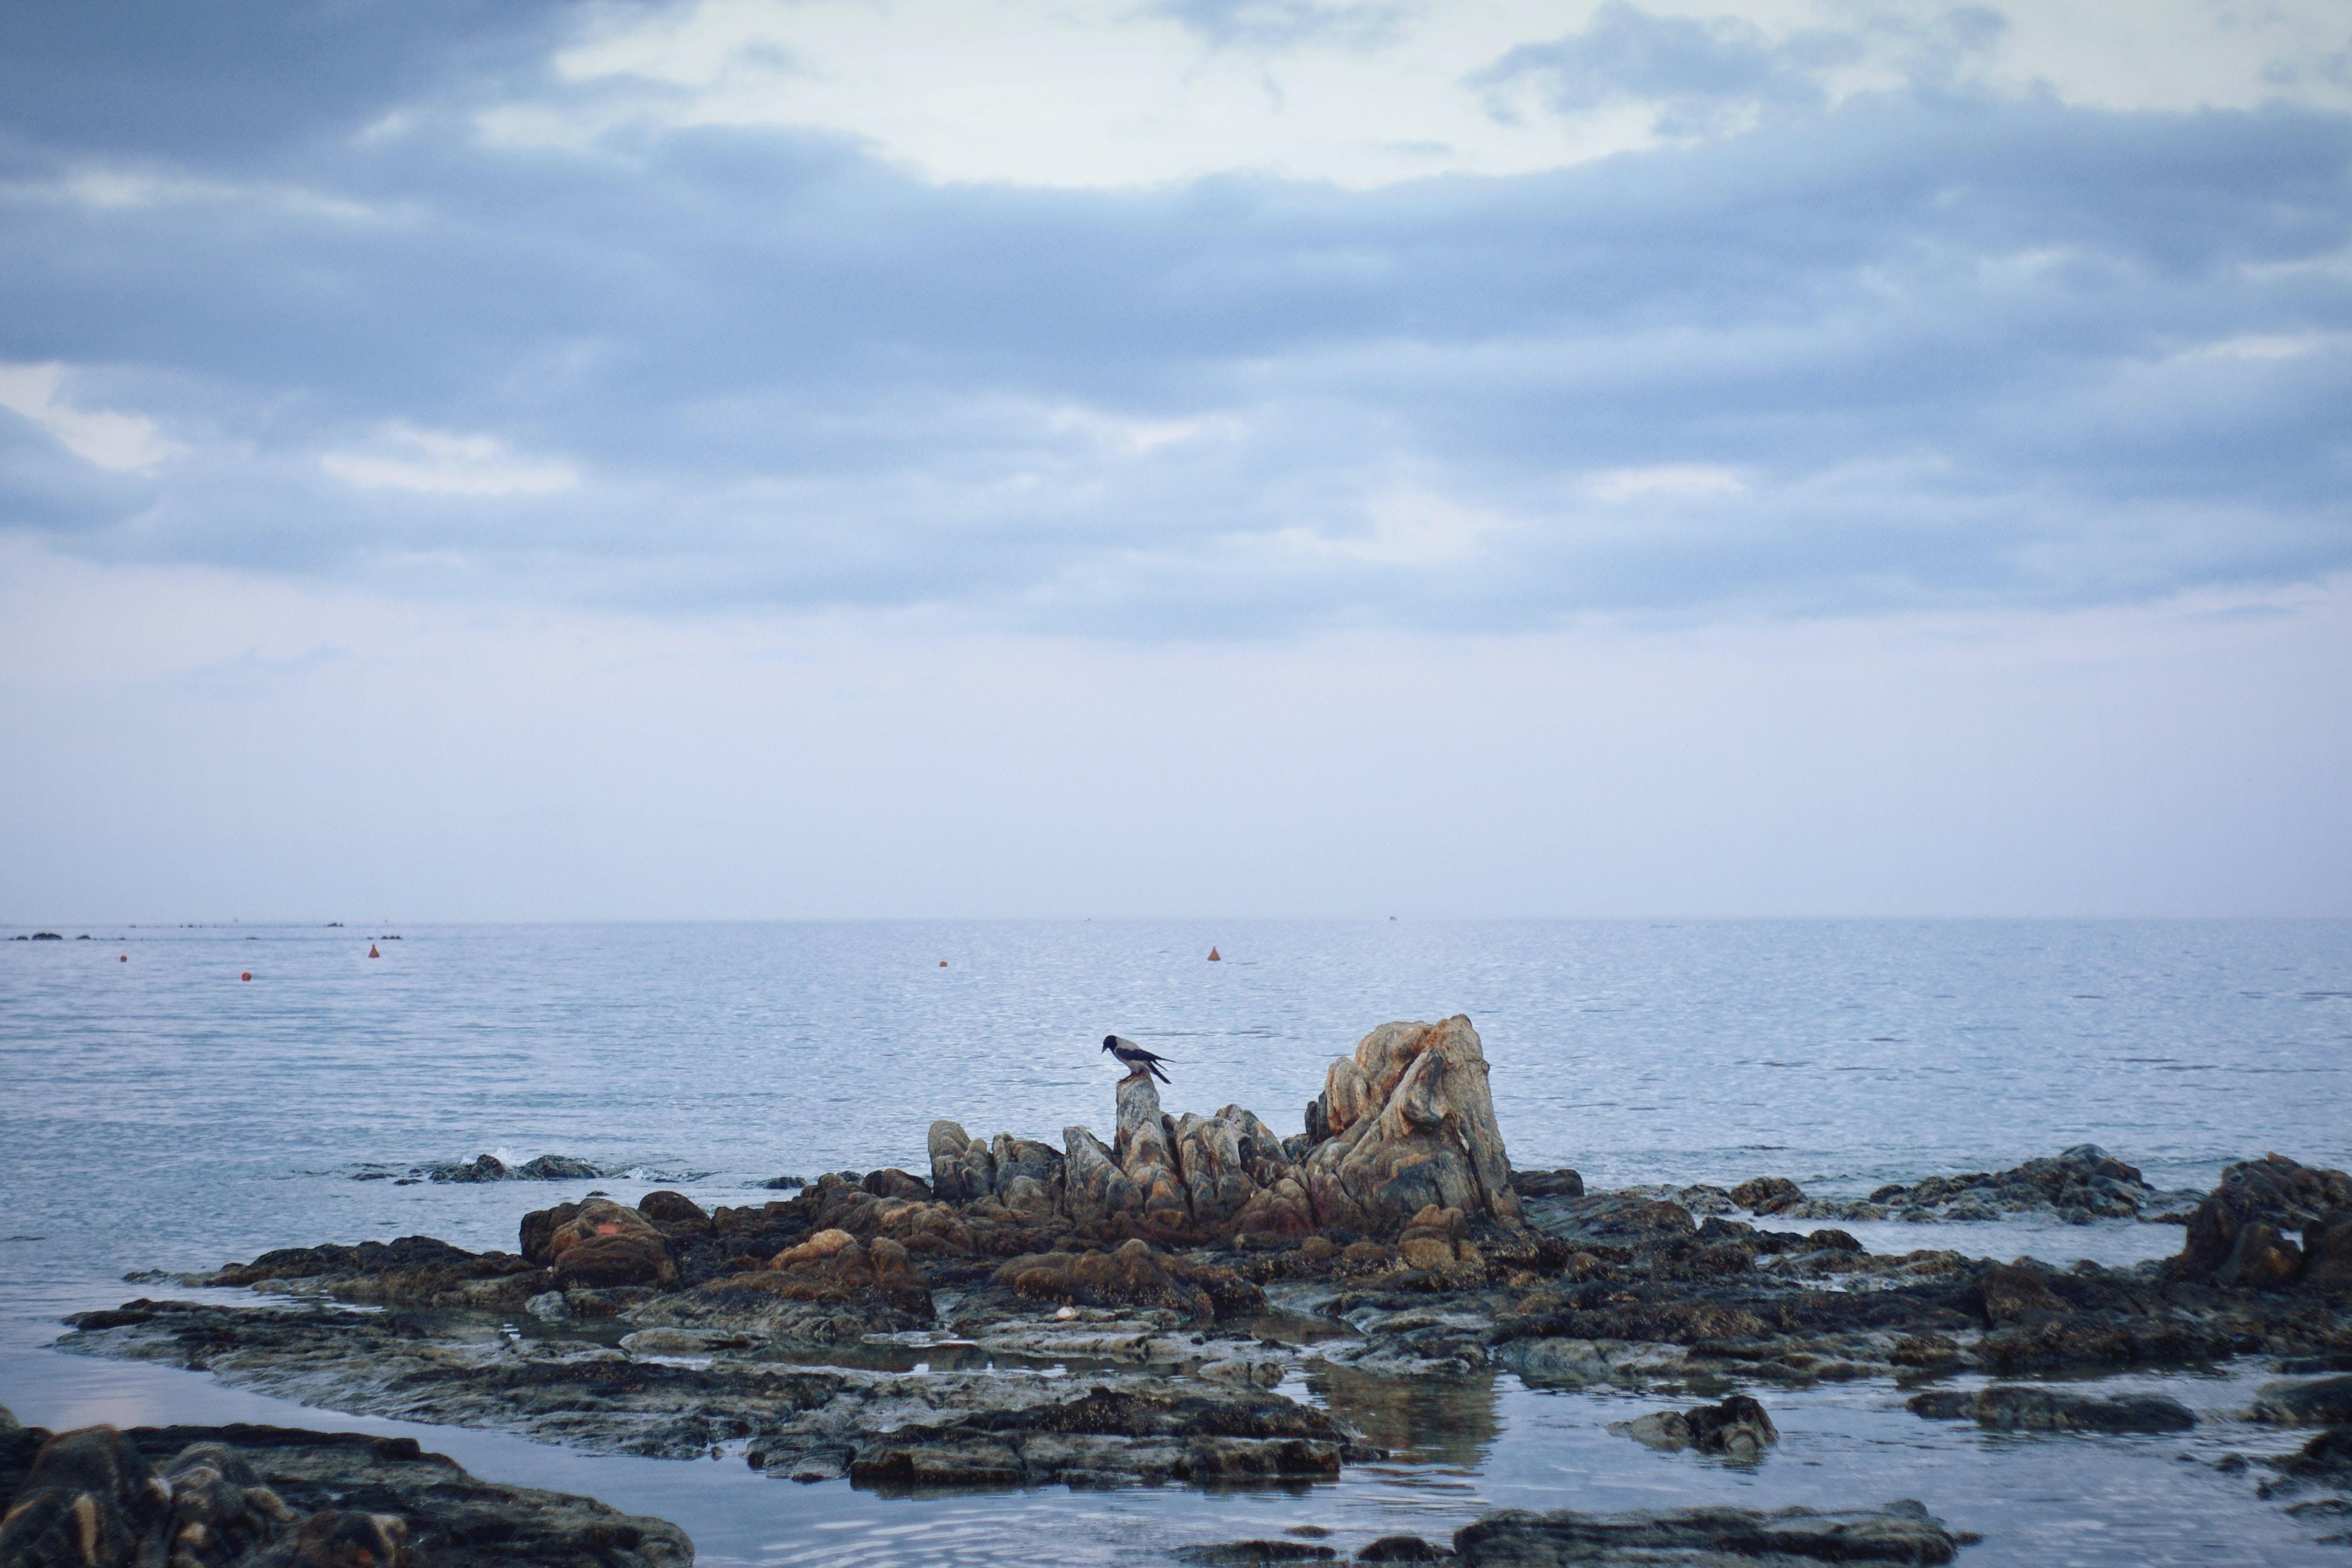 bird standing on stone under cloudy sky